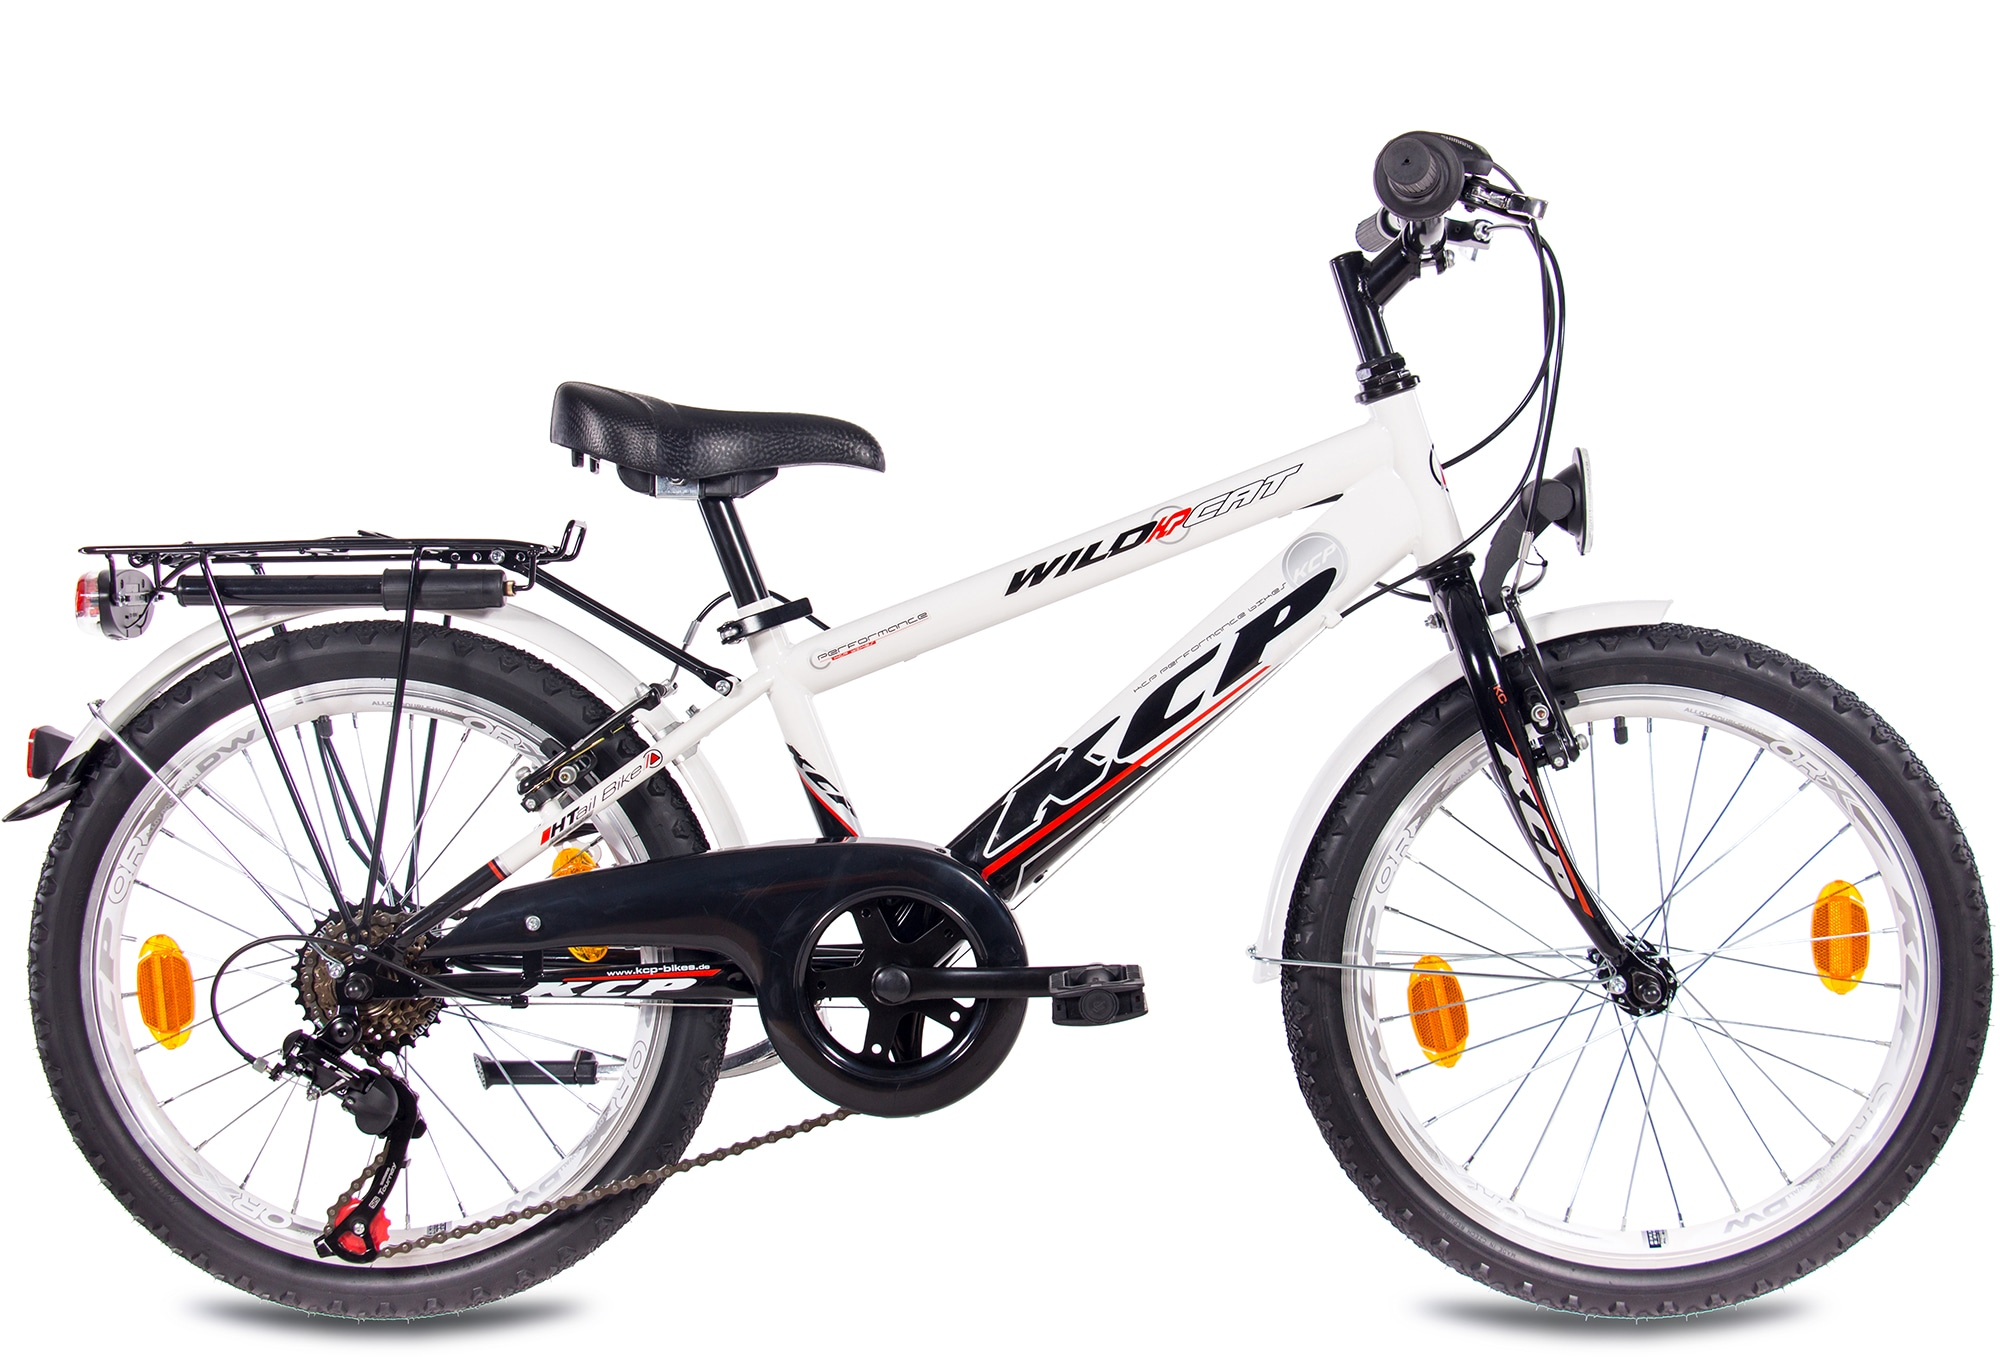 KCP Kinderfahrrad Wild Cat, 6 Gang, Shimano, Tourney RD-TZ500-GS Schaltwerk, Kettenschaltung schwarz Kinder Kinderfahrräder Fahrräder Zubehör